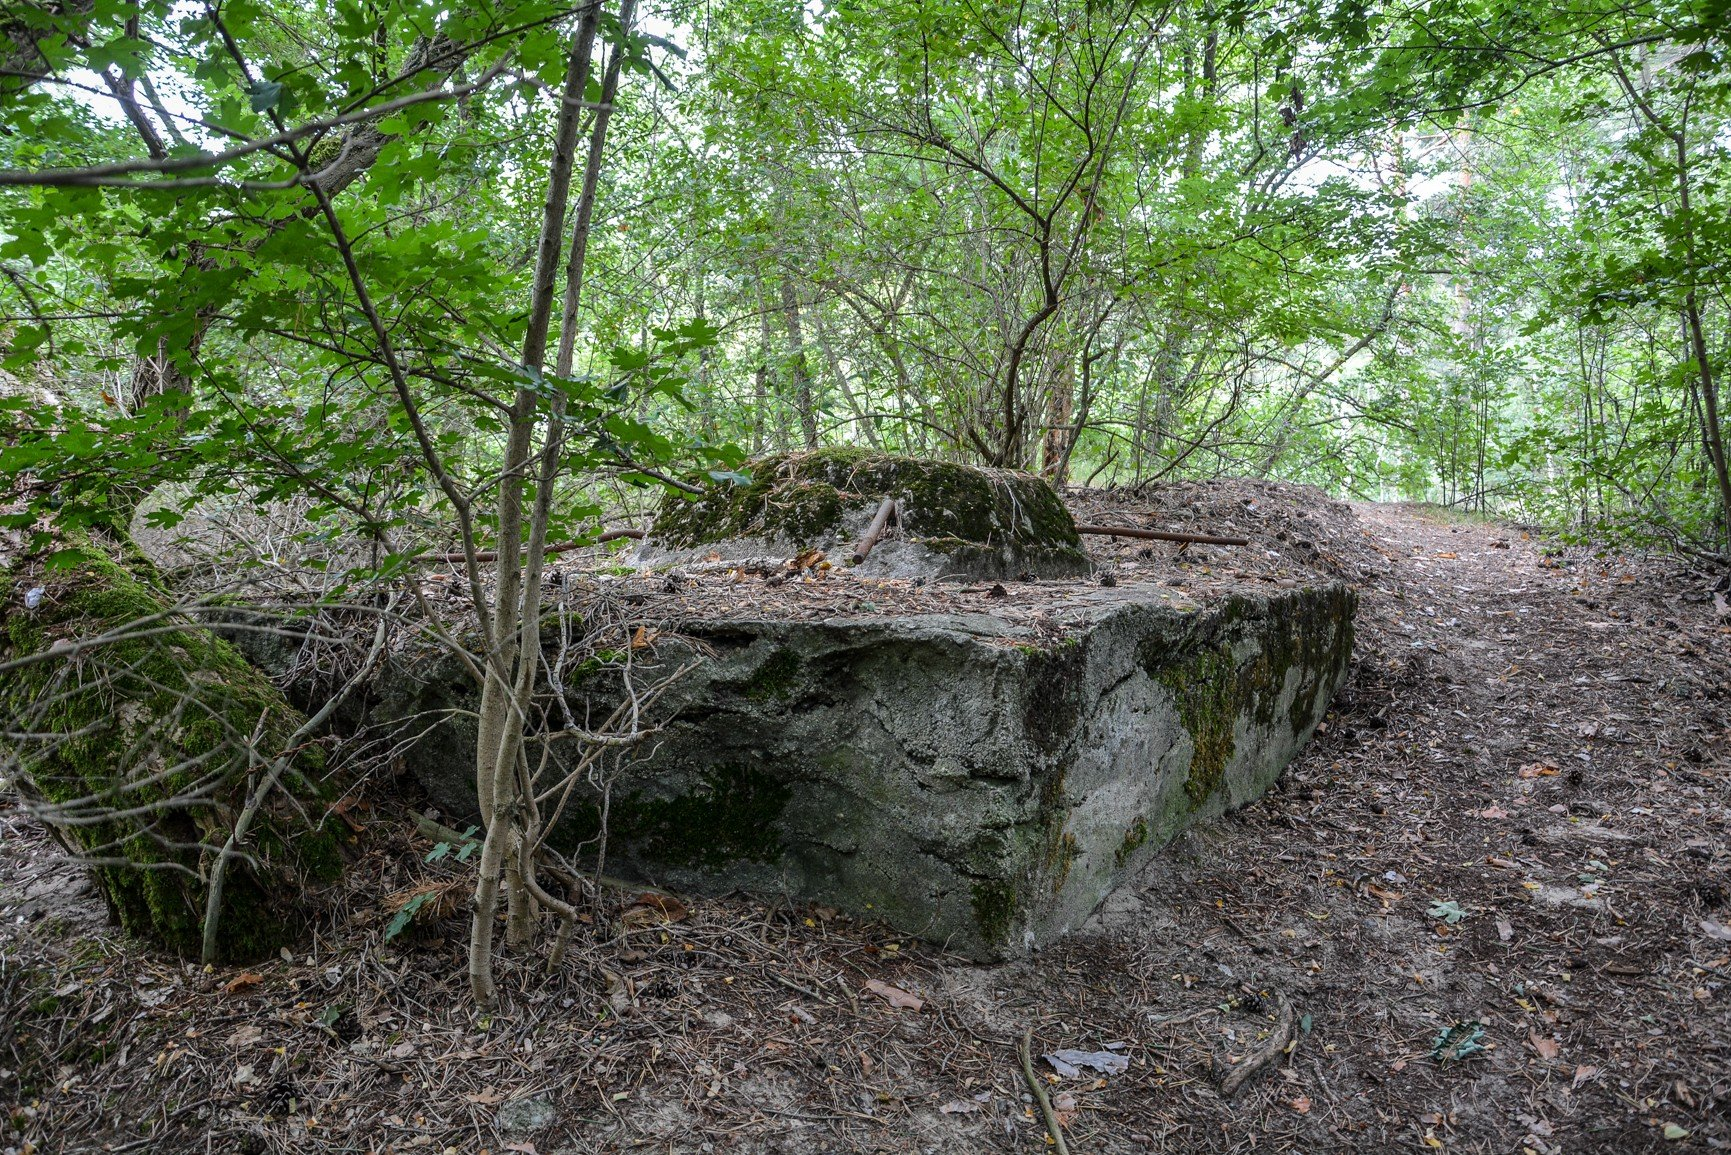 keerans range concrete avus südkurve hügel hill berlin charlottenburg lost places urbex abandoned berlin